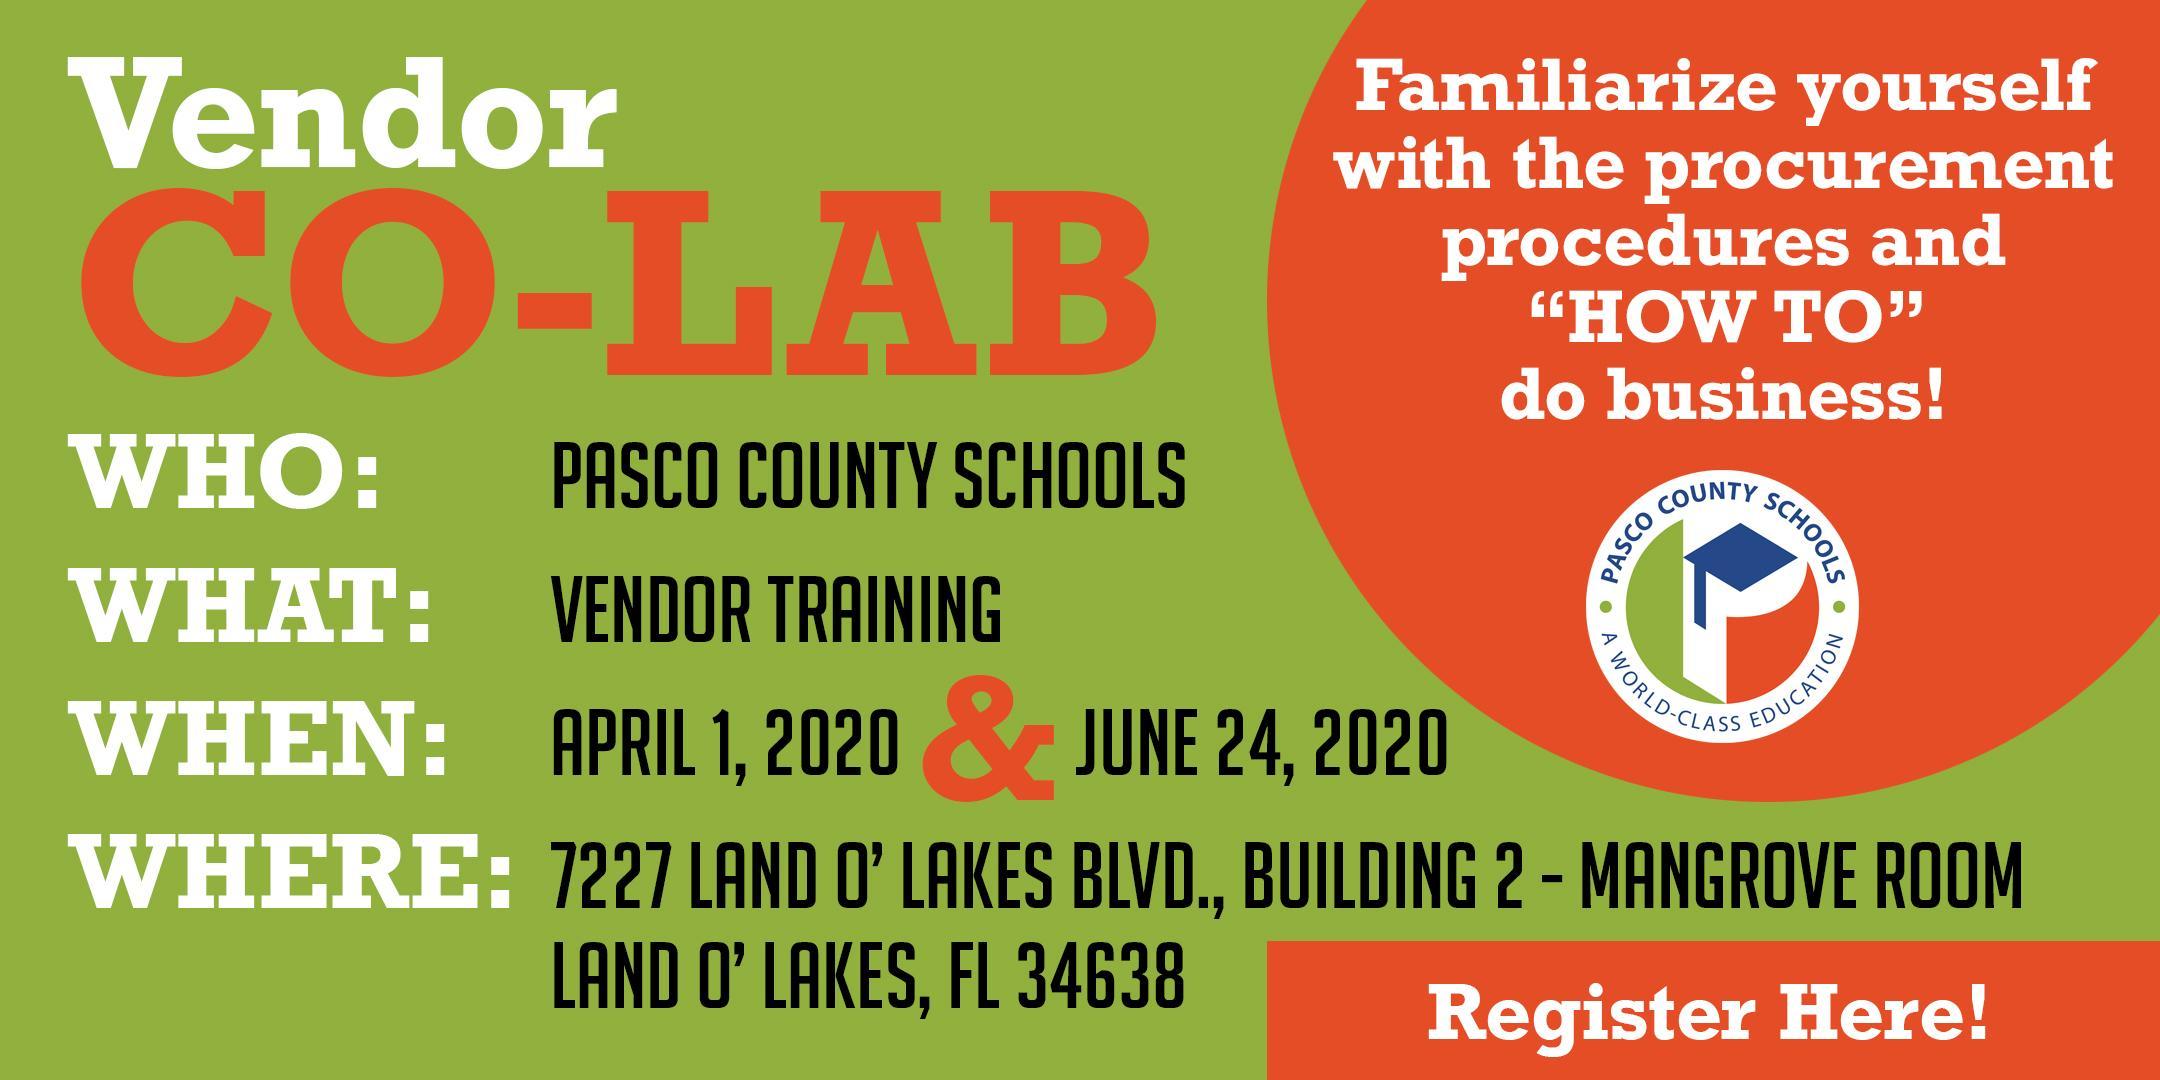 Vendor Co-LAB with Pasco County Schools